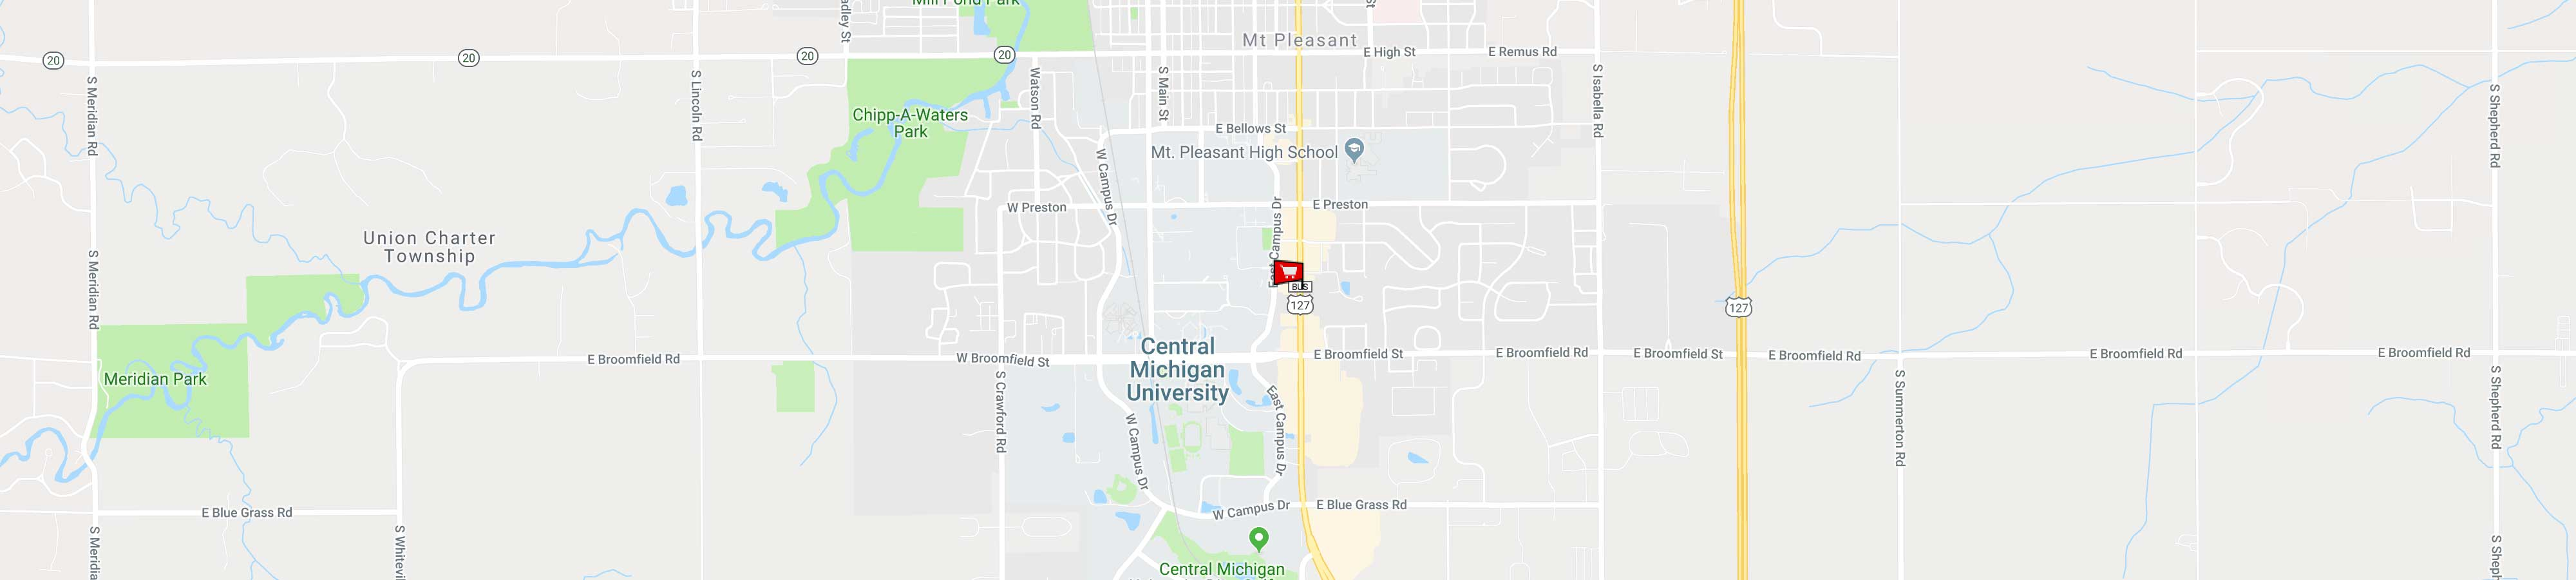 Mount Pleasant High School Campus Map - Software Help